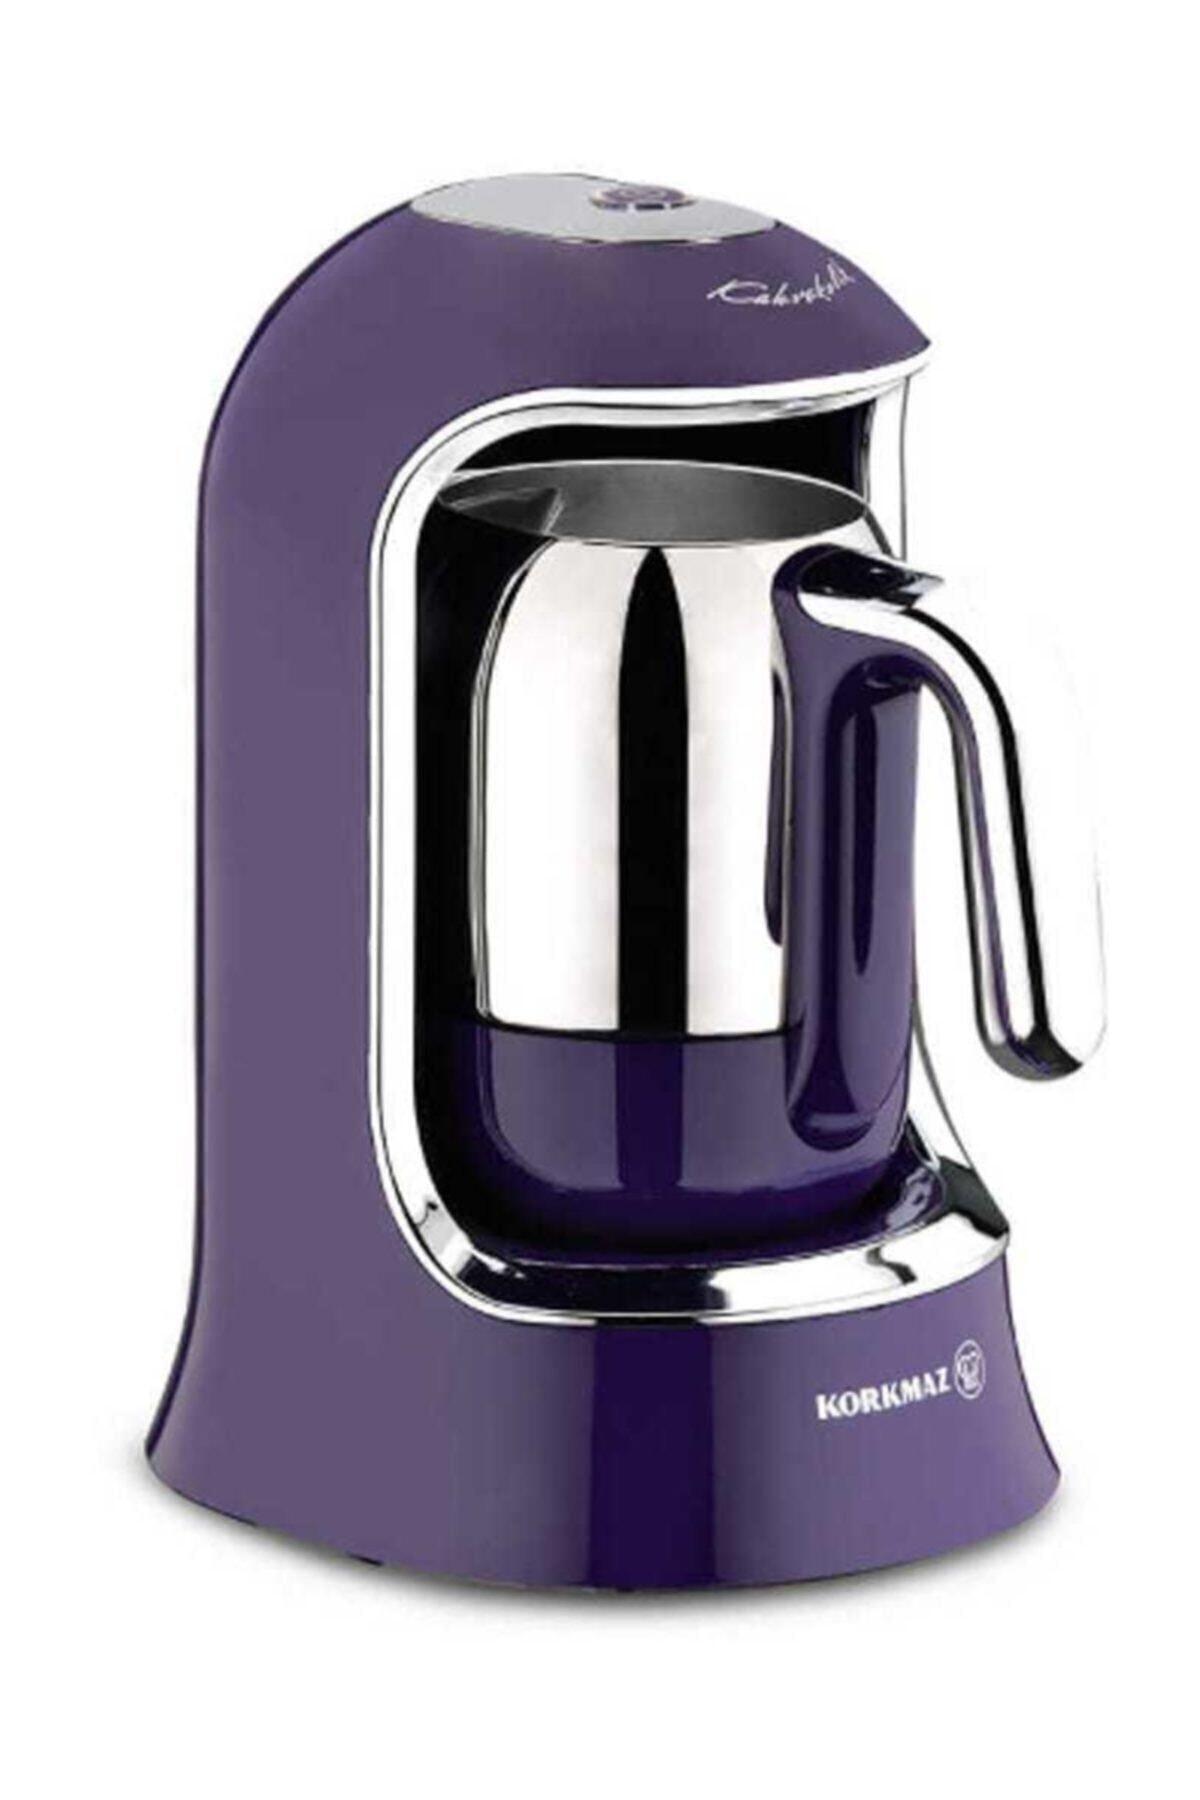 A860 01 Kahvekolik Lavanta Kahve Makinesi